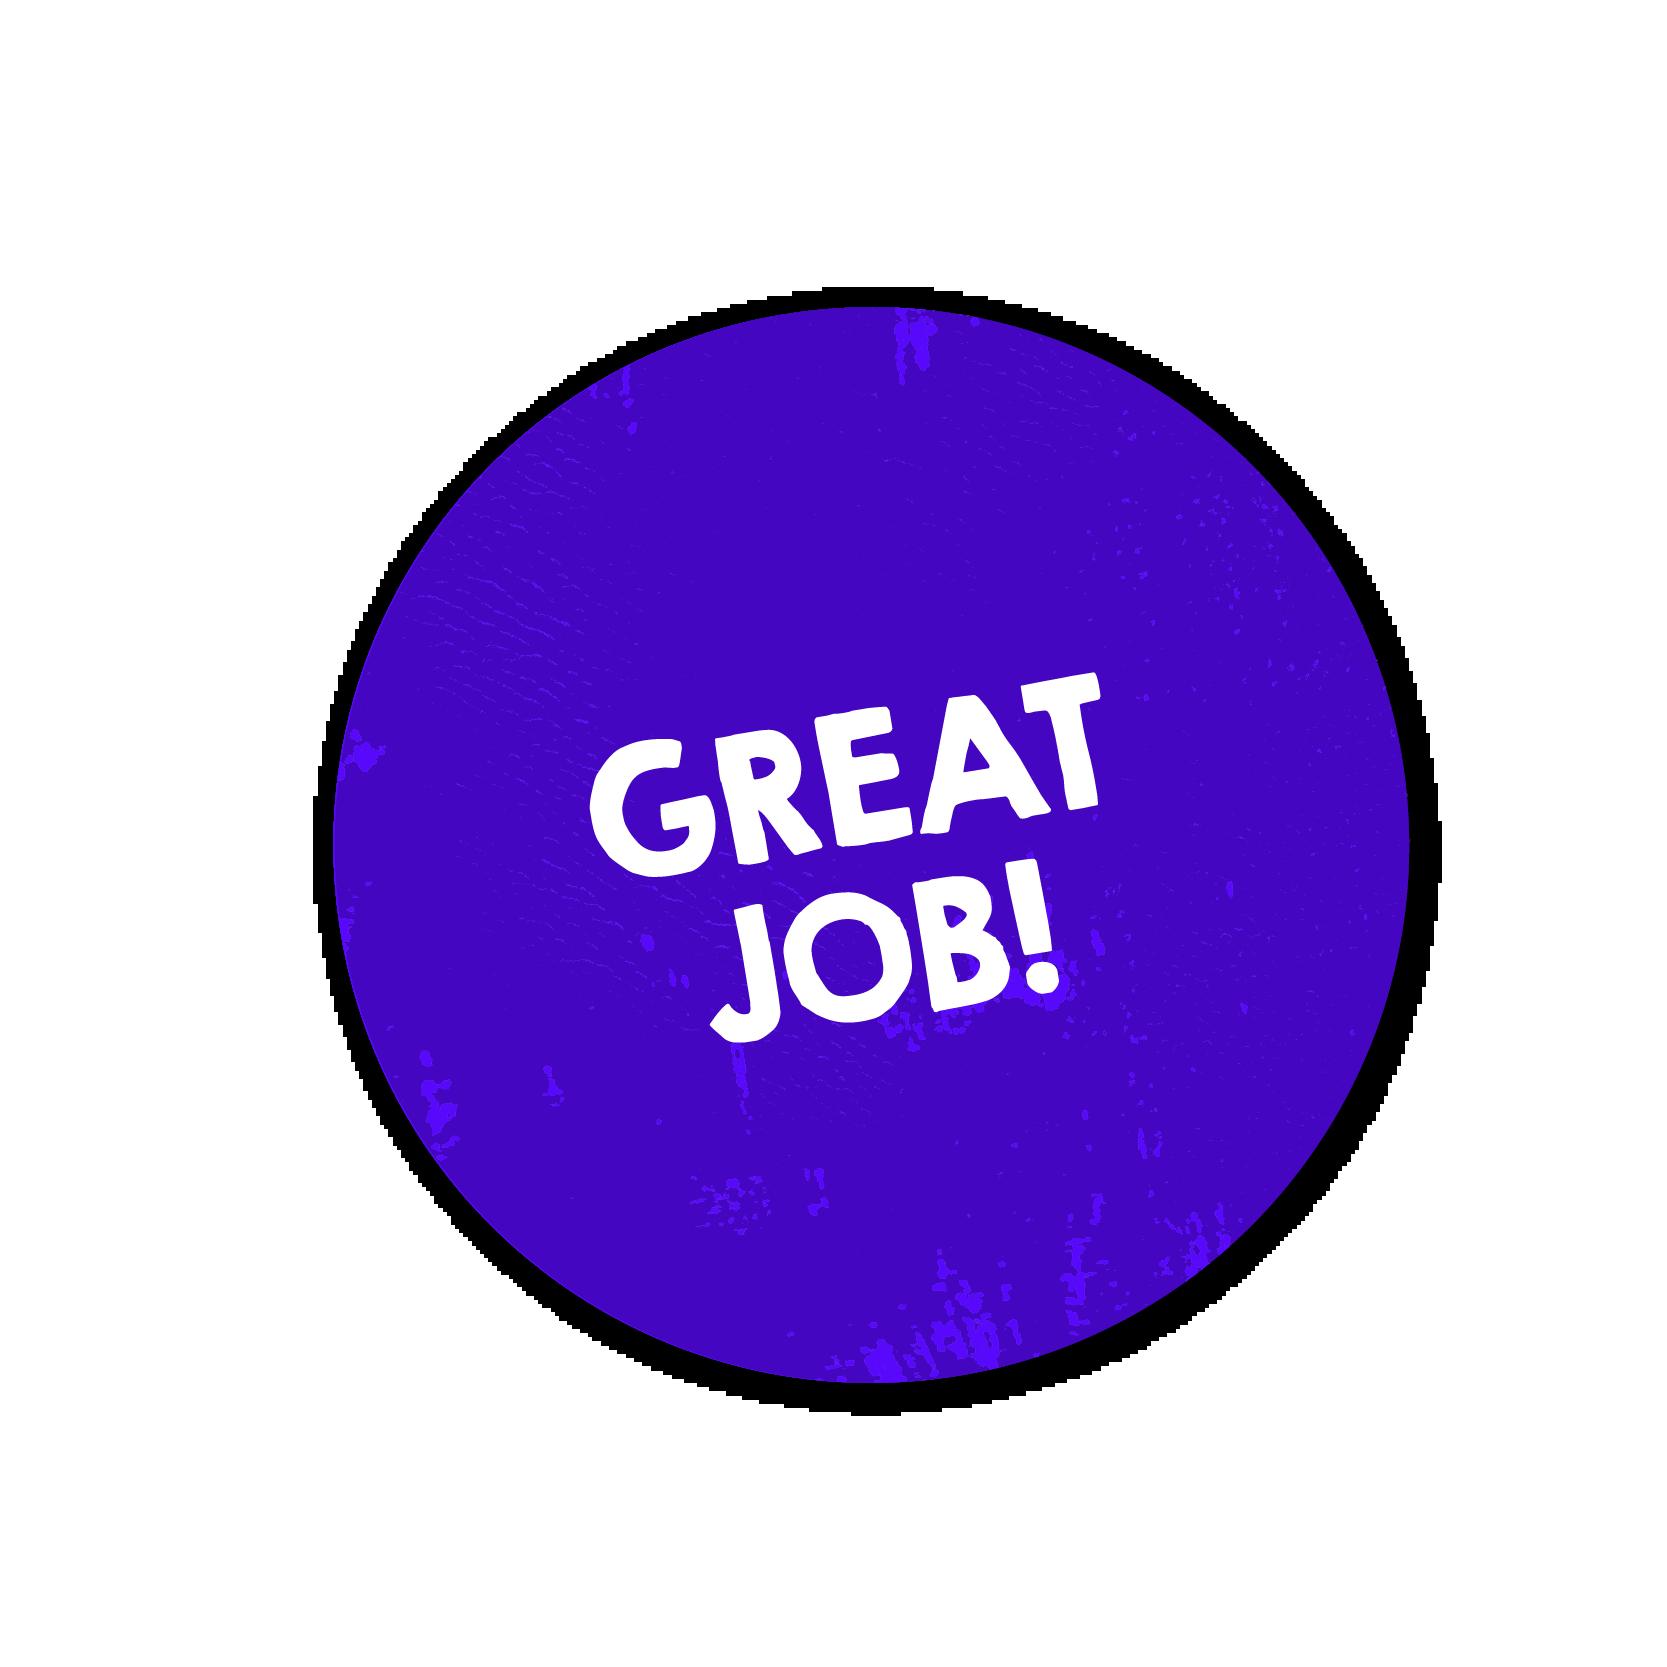 A purple sticker that says 'Great Job!'